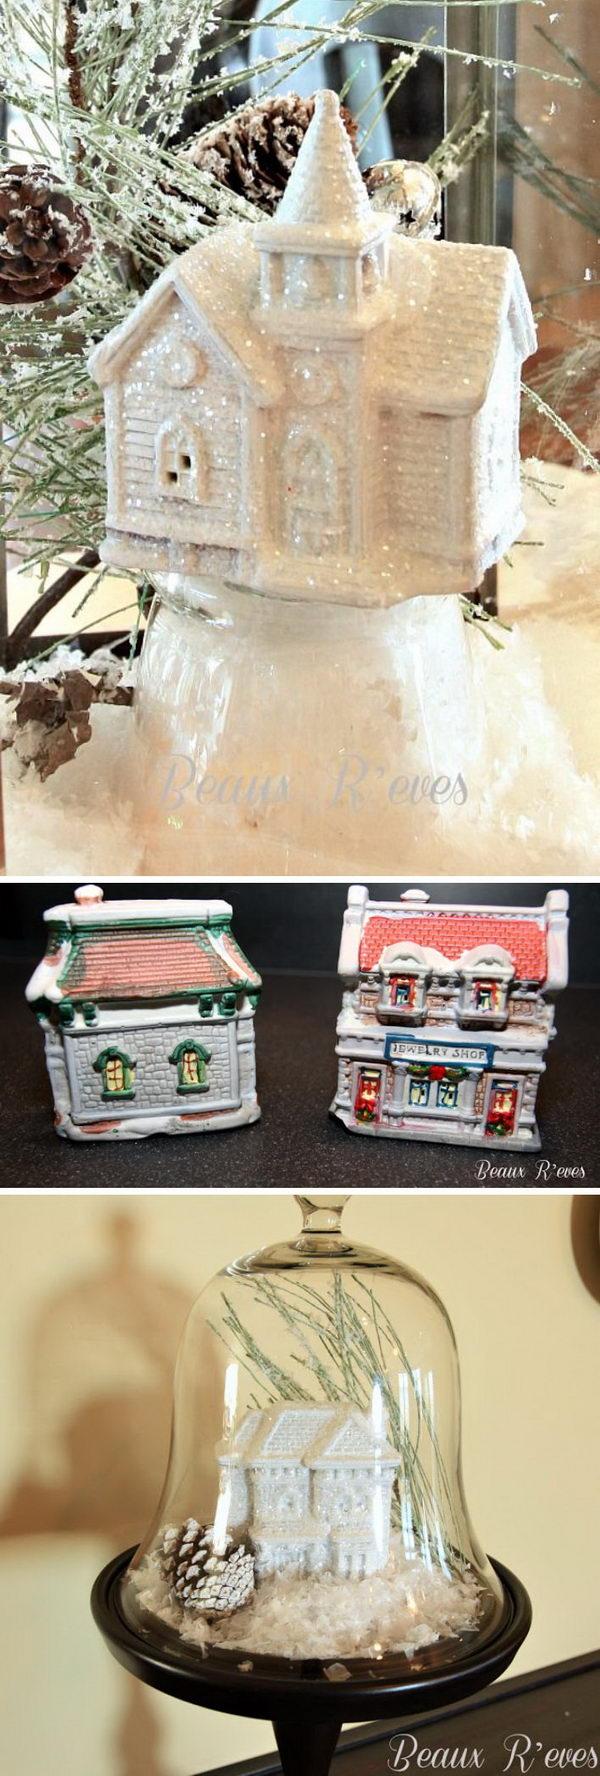 2. Winter Cottage